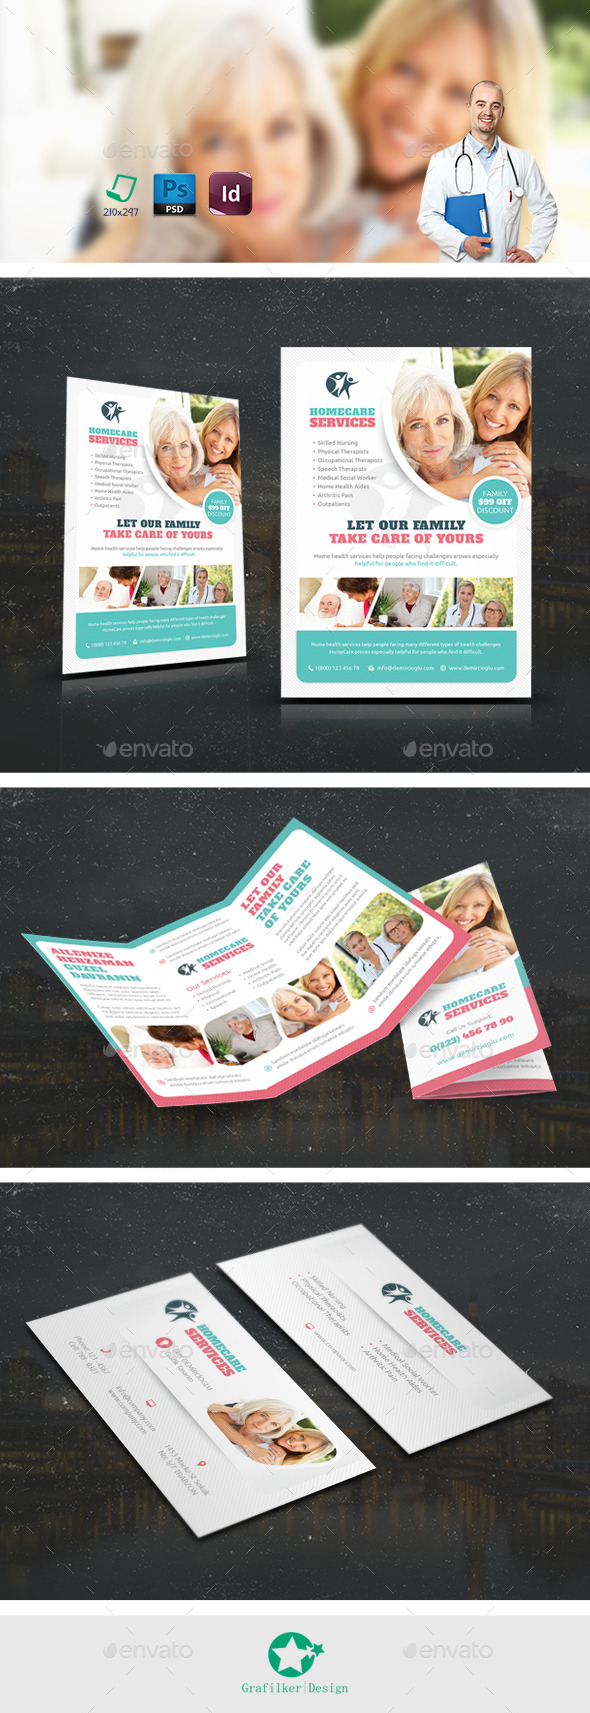 GraphicRiver Home Care Bundle Templates 10885385